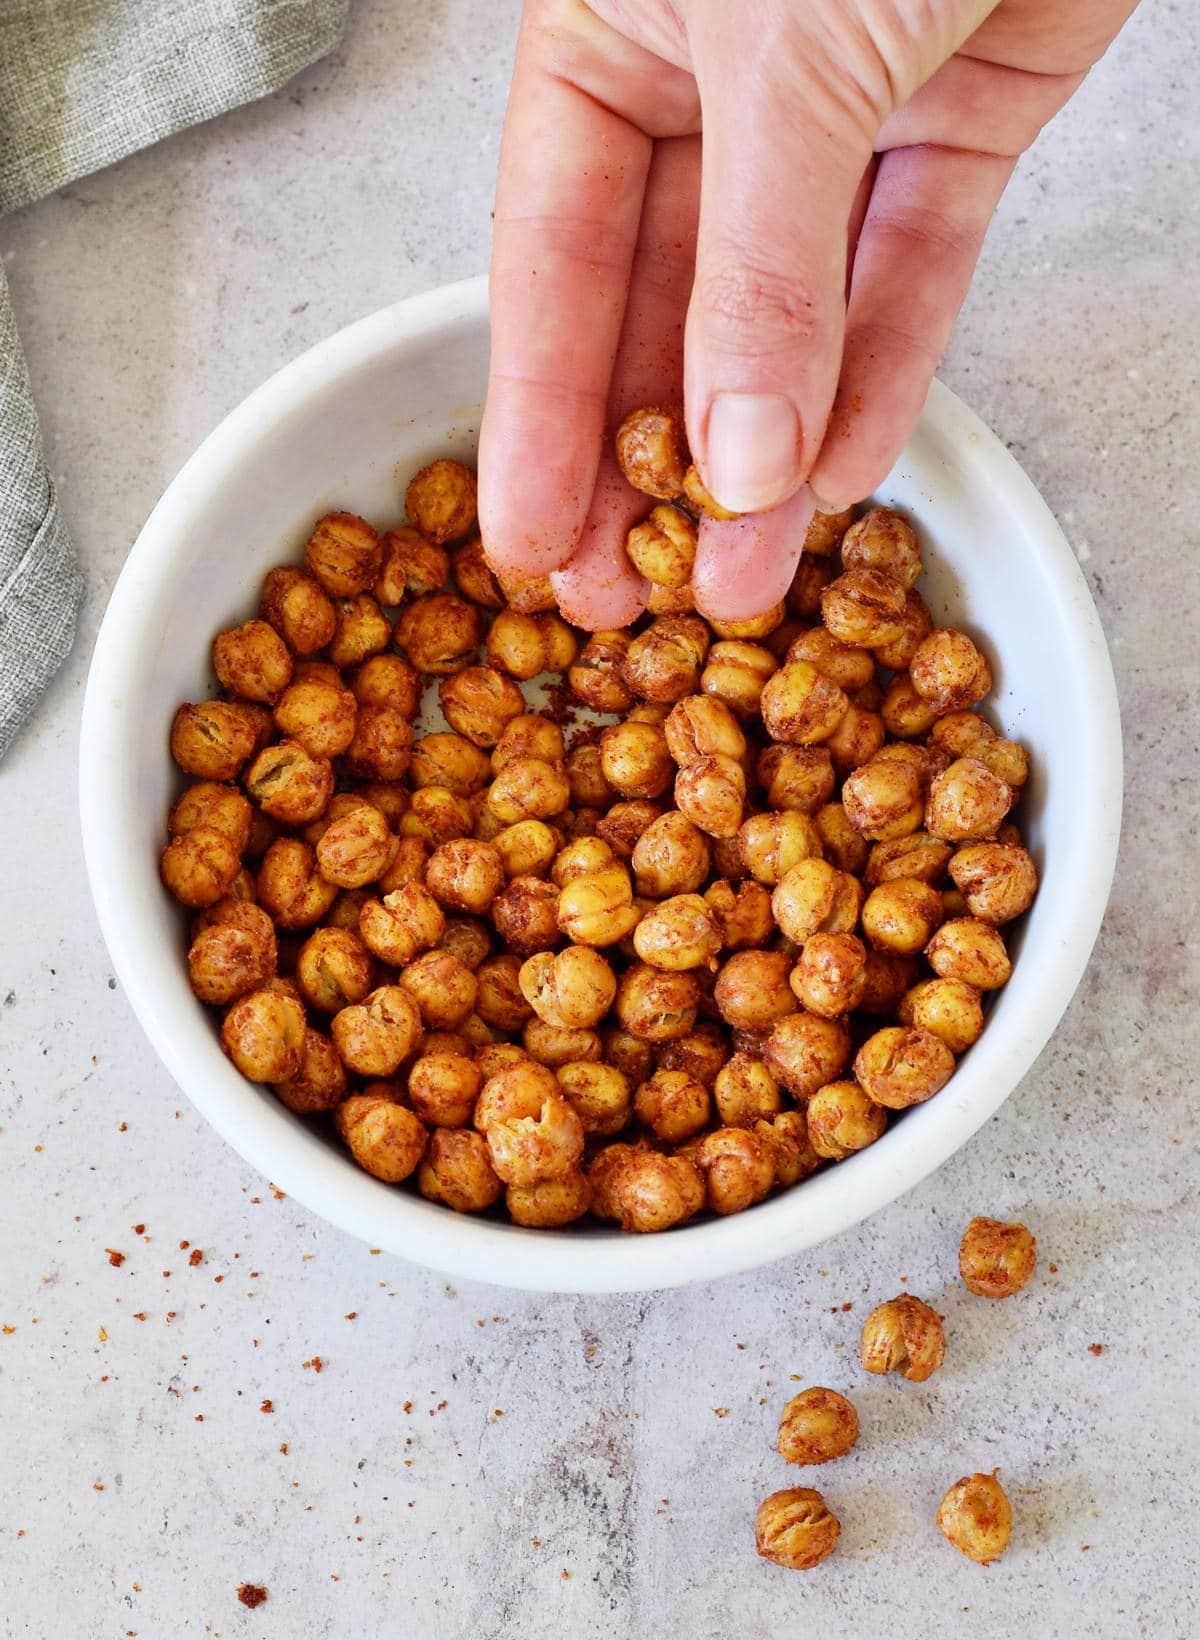 hand grabbing crispy roasted garbanzo beans from white bowl